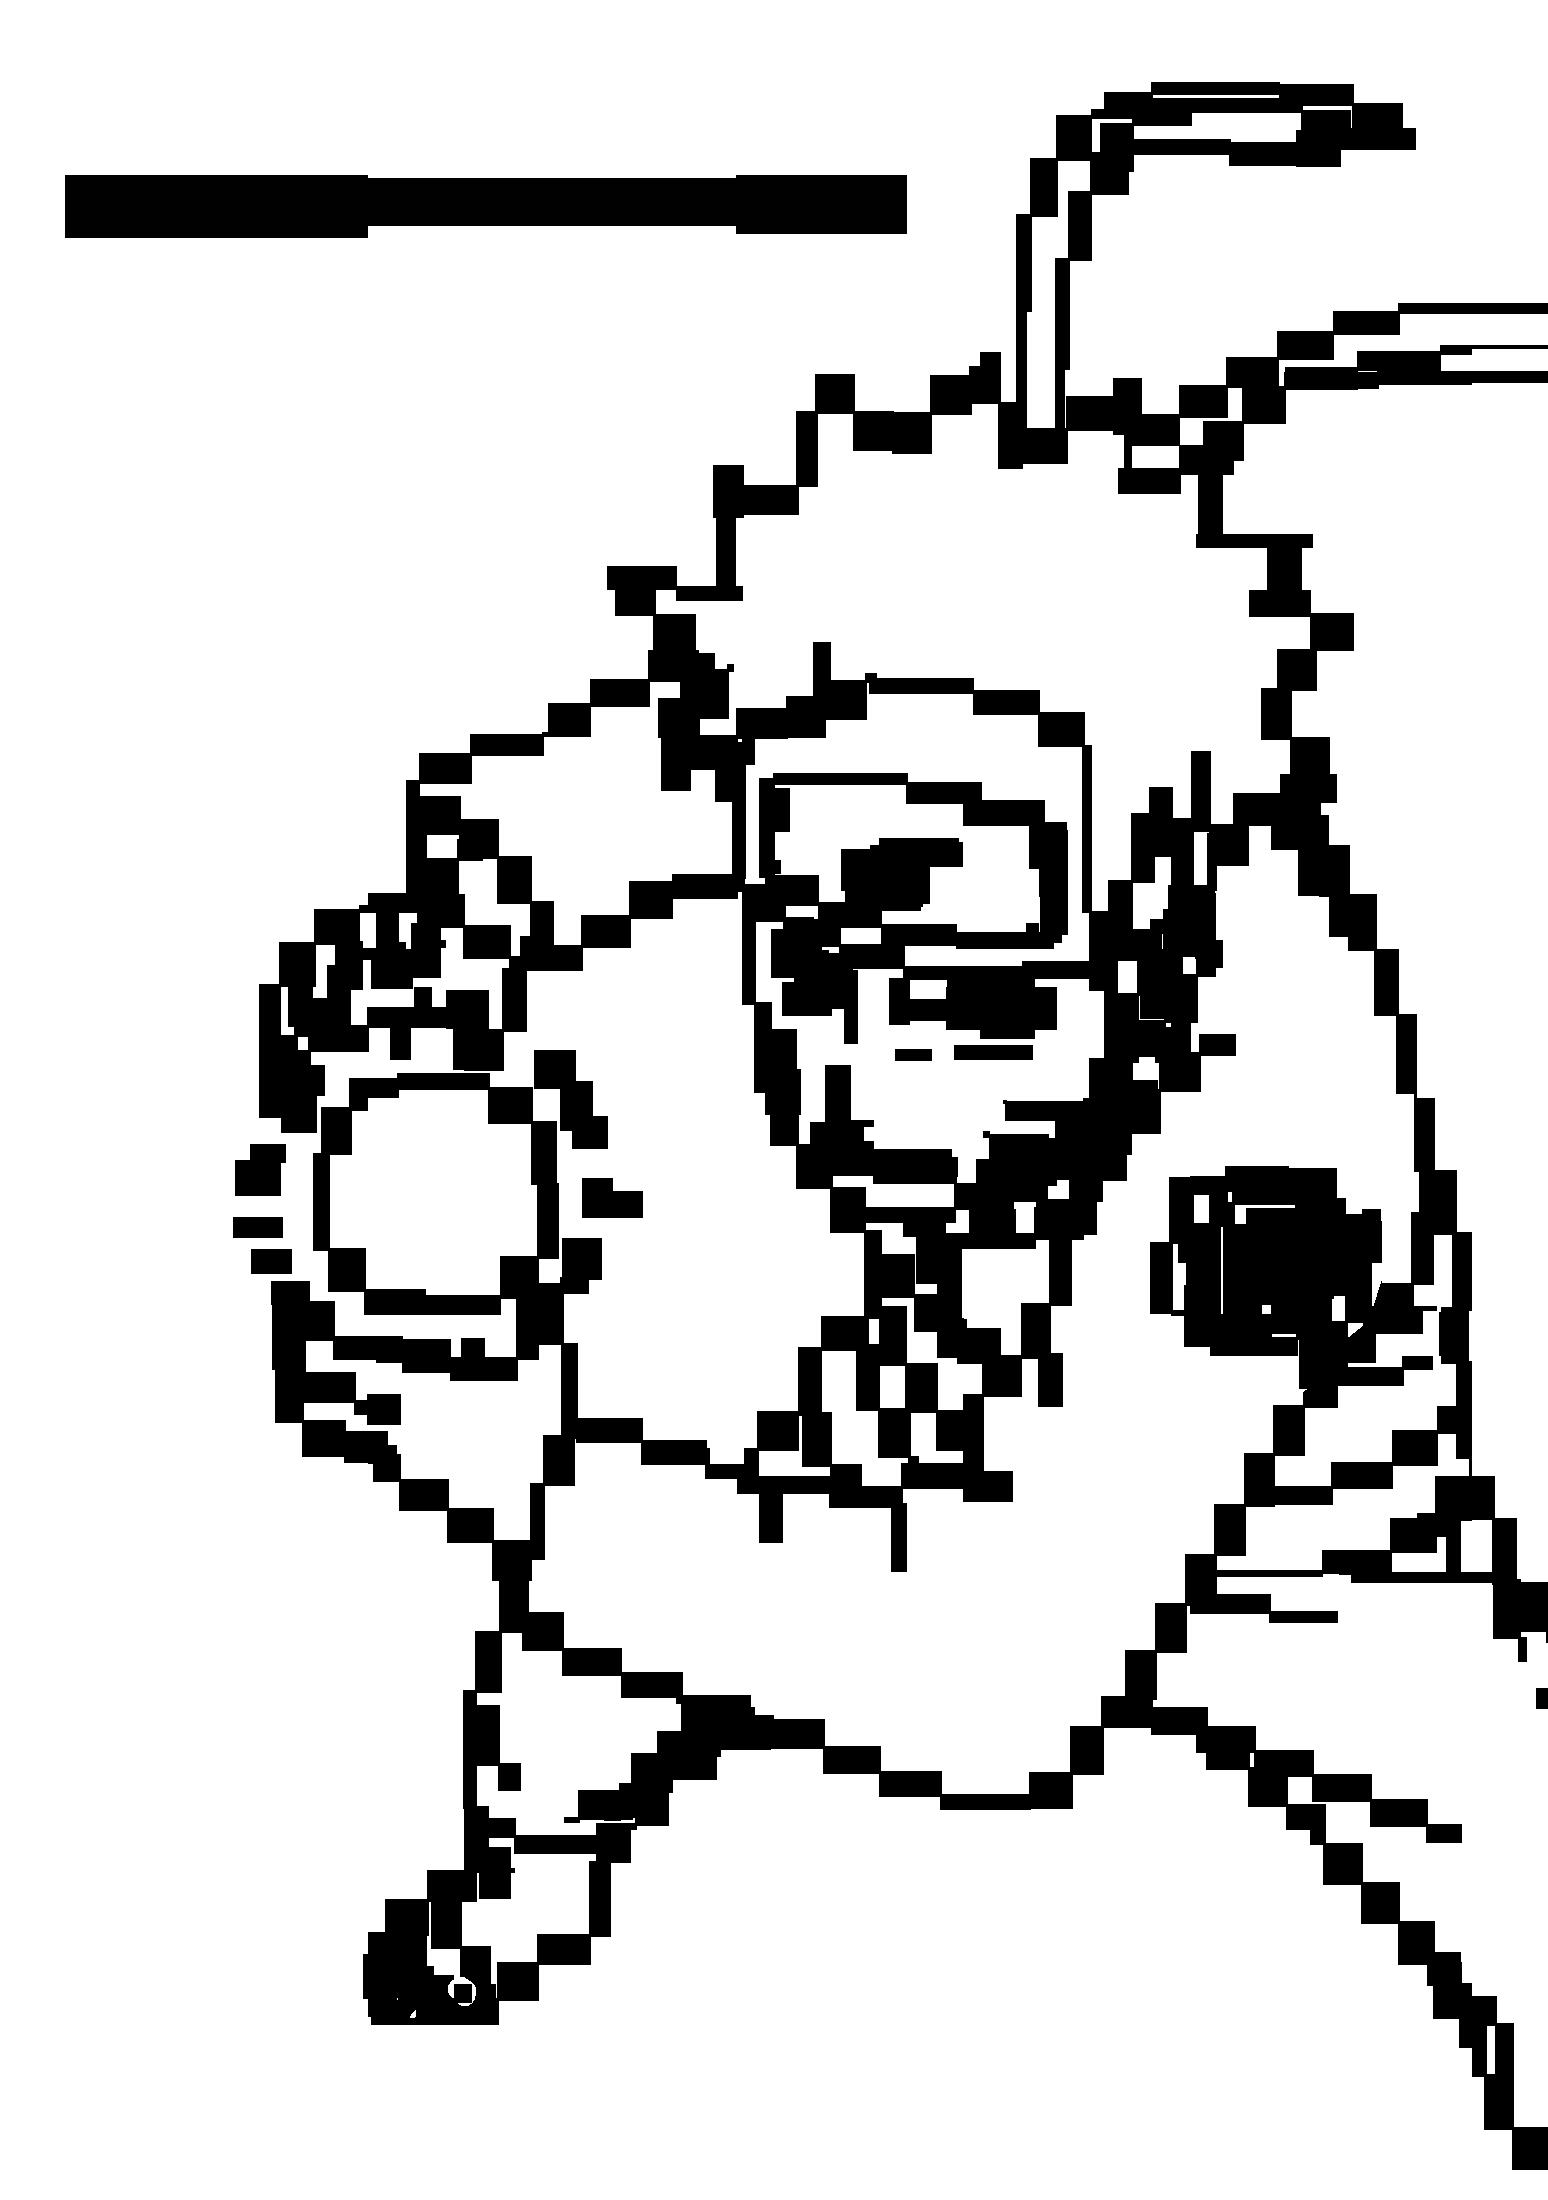 Naruto Rasengan Ii Lineart By M1ur0 On Deviantart